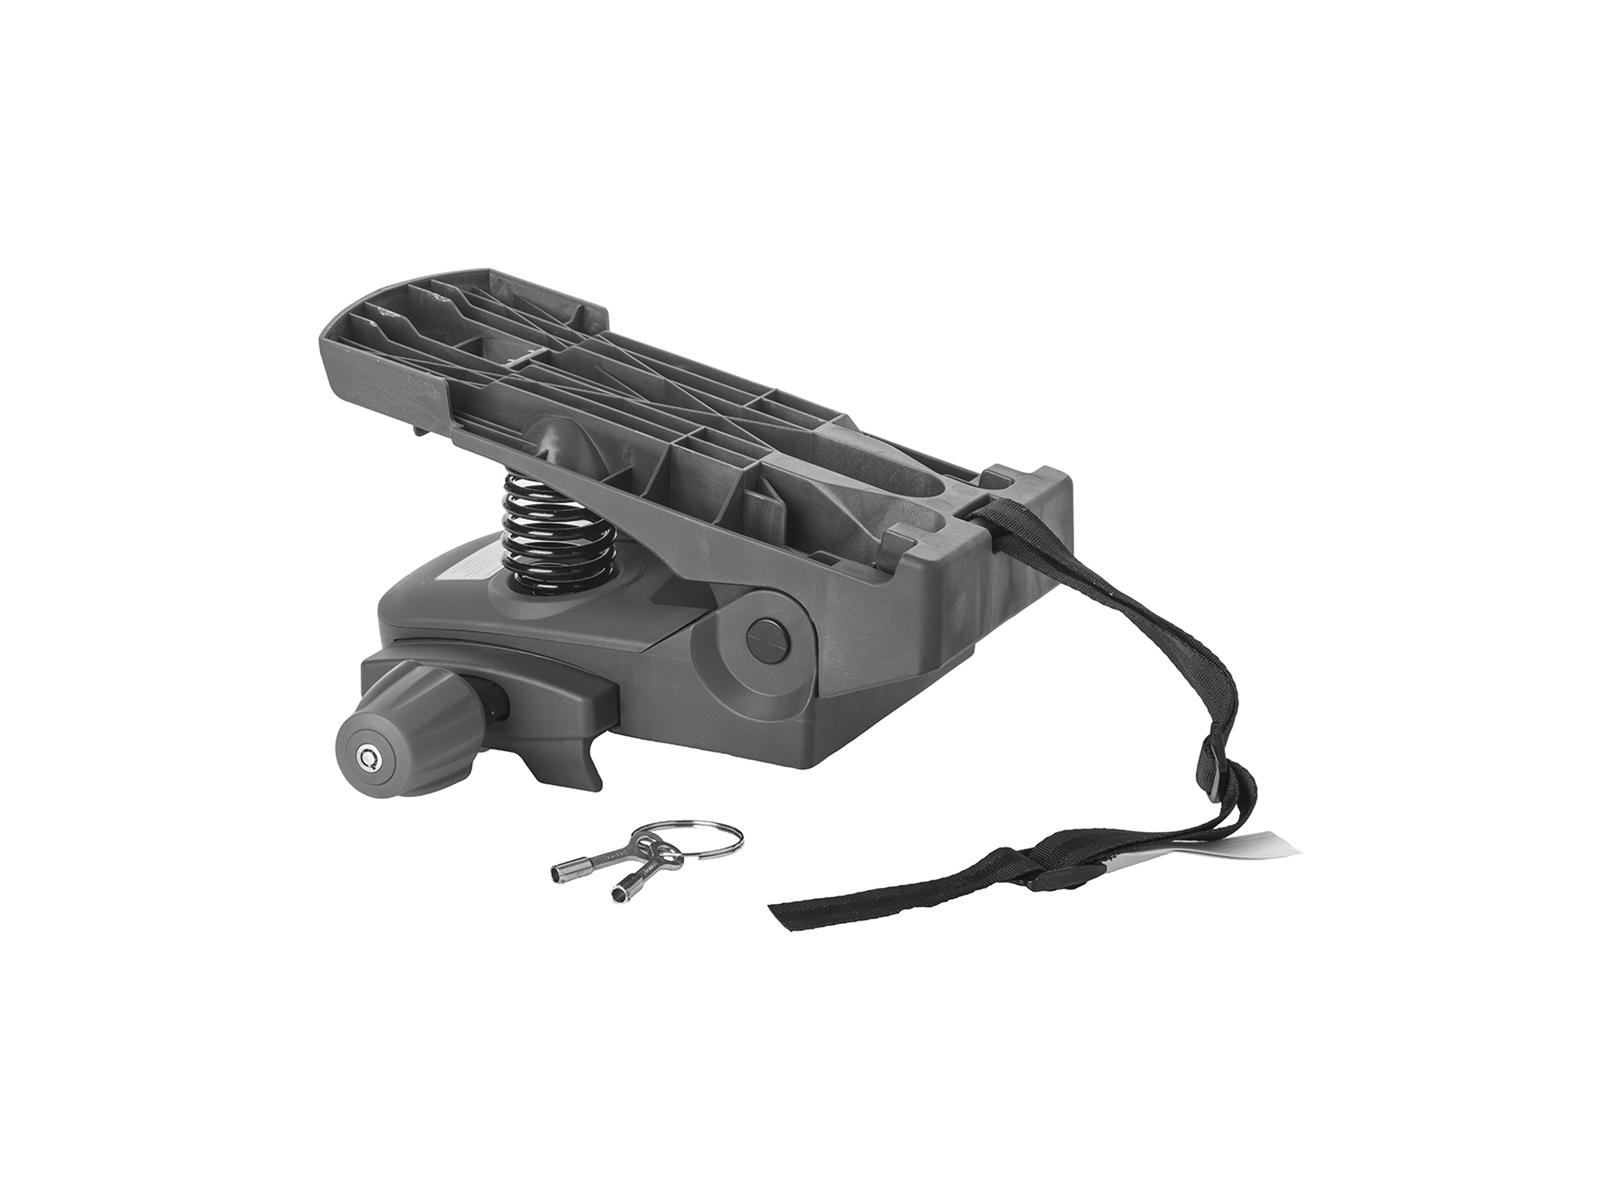 Hamax Caress Carrier Adapter